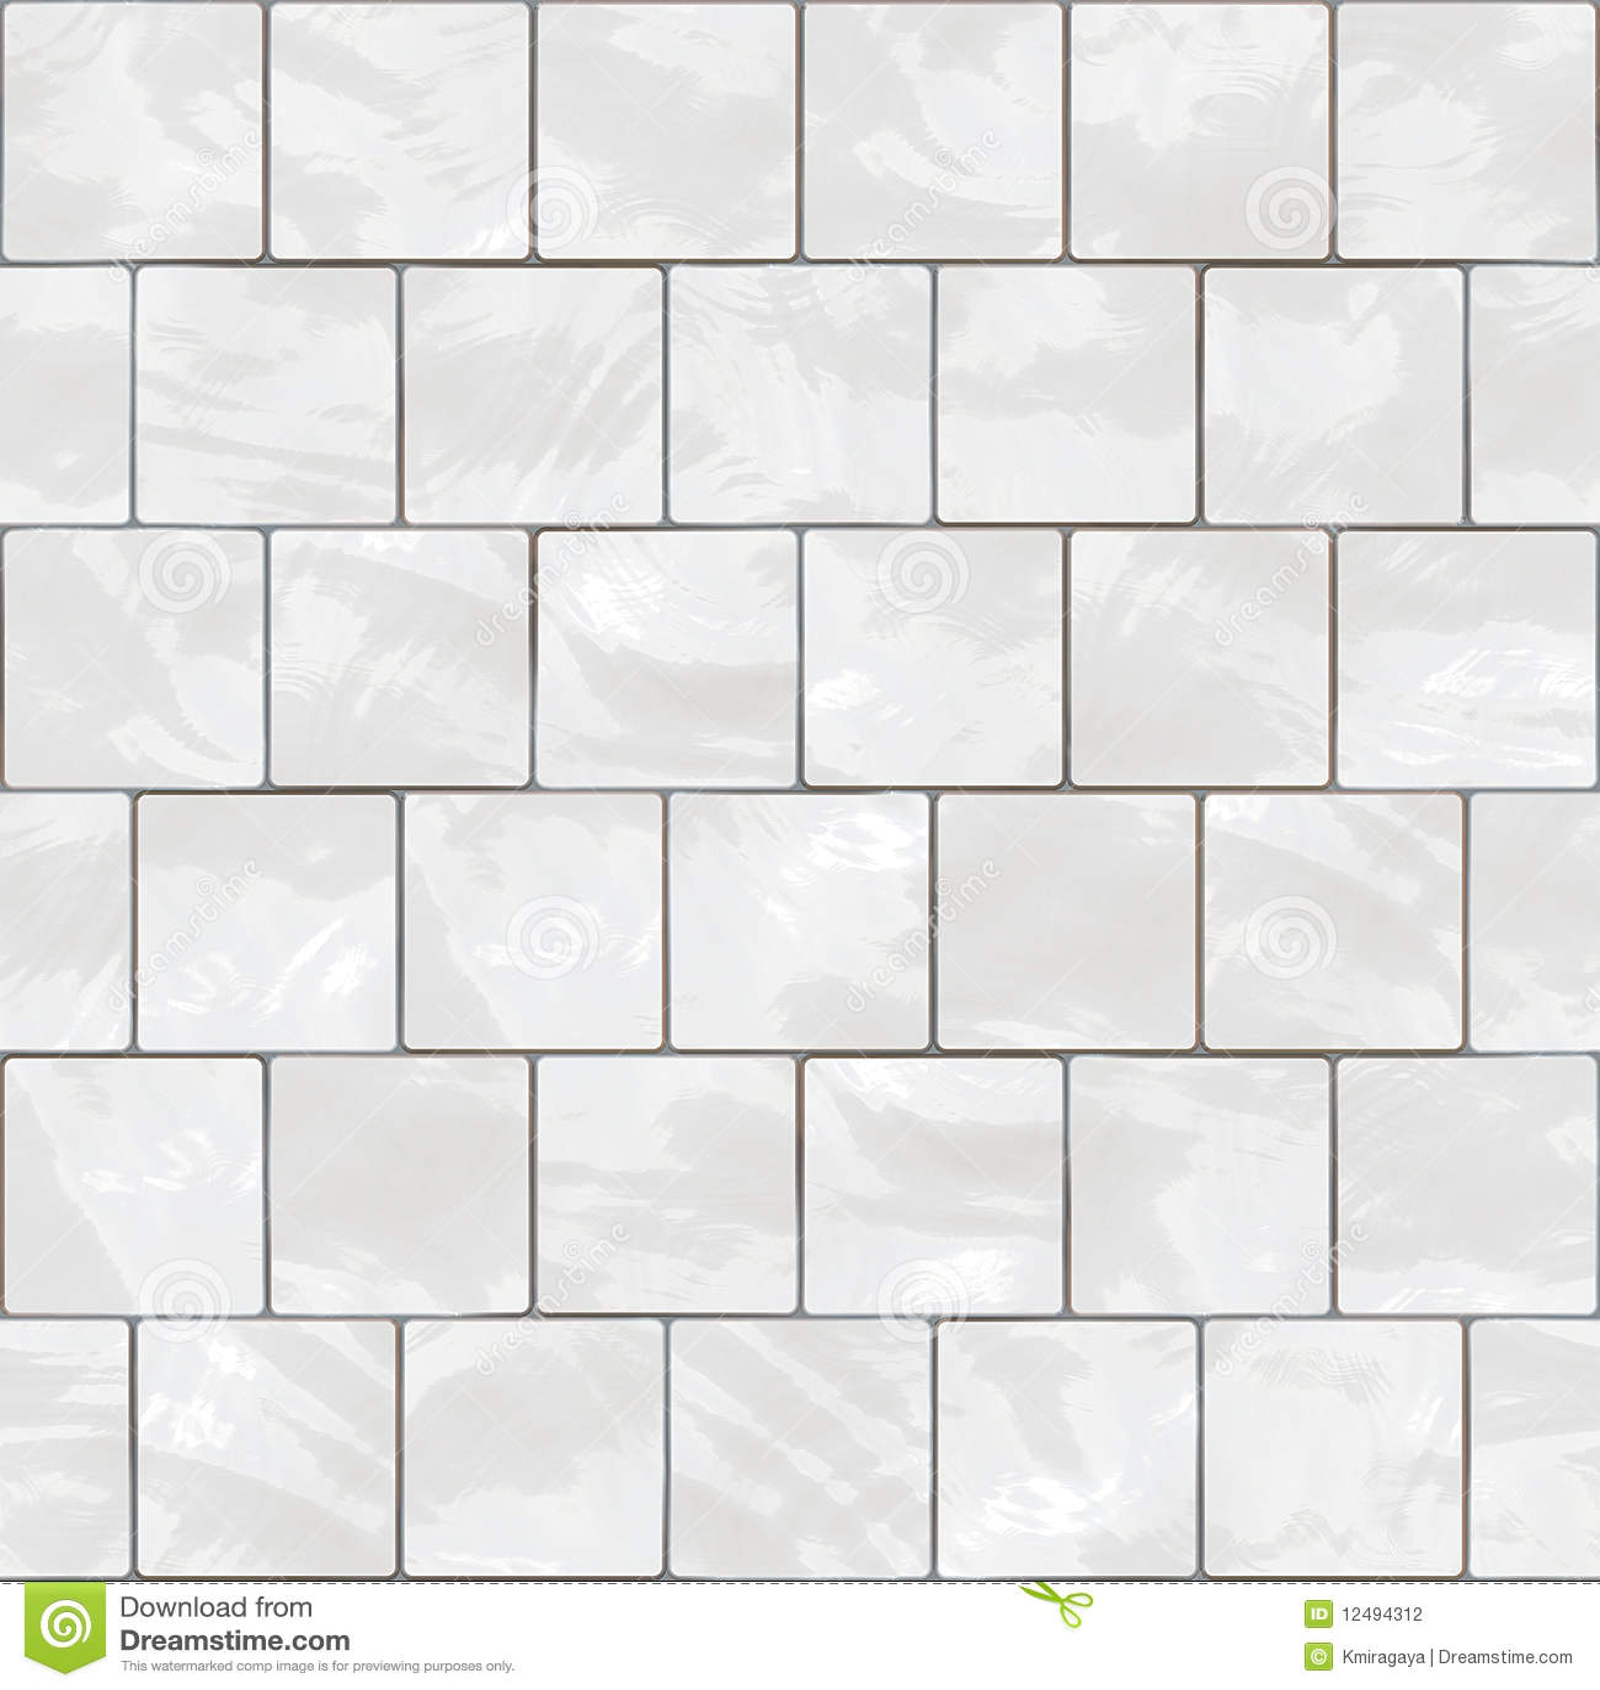 Bathroom Tile Texture Seamless